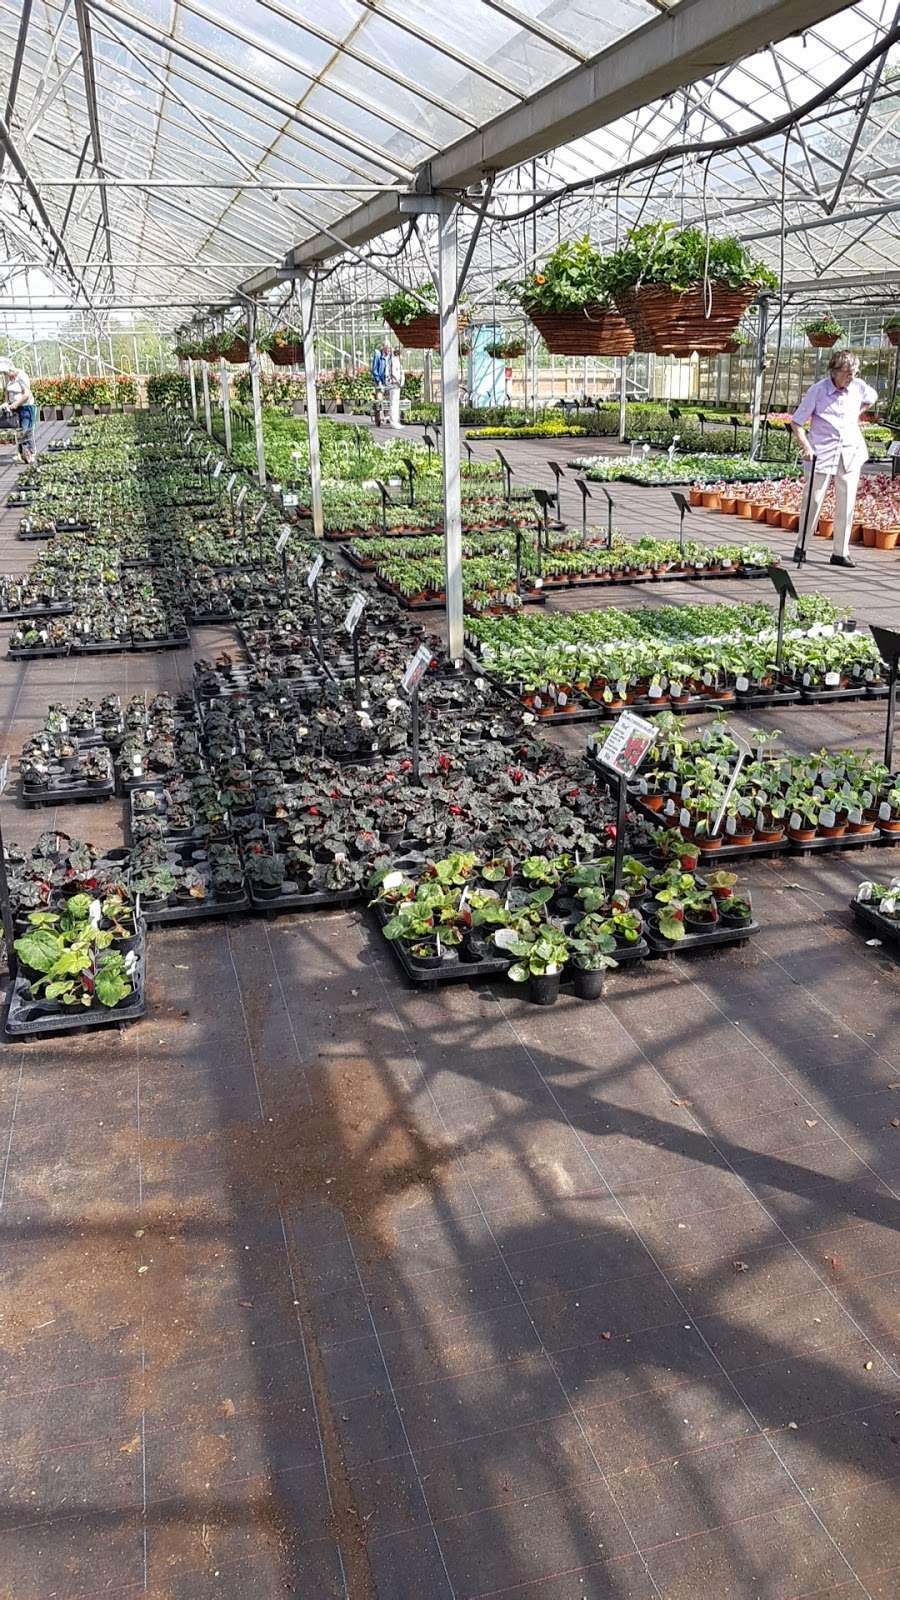 Matthews Plants - store  | Photo 1 of 10 | Address: Hadley Nursery, Tylers Rd, Roydon, Harlow CM19 5LJ, UK | Phone: 01279 793539